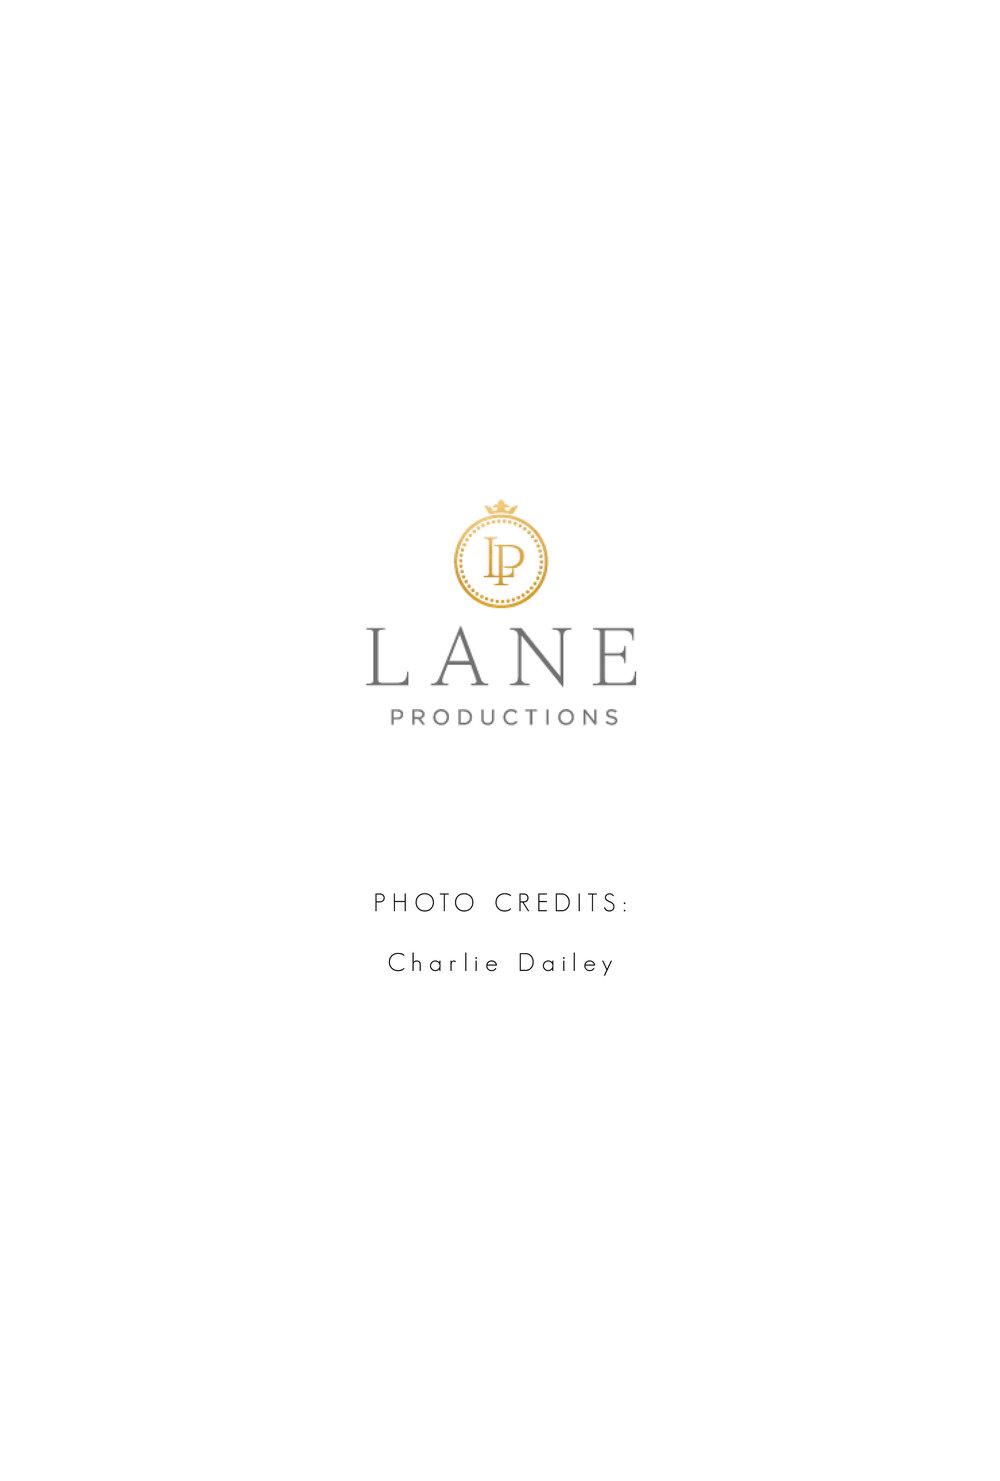 Charlie+Dailey+LP+Photo+Credits+Billie+Media+Mallorca+Photographer+Lane+Productions+.jpg